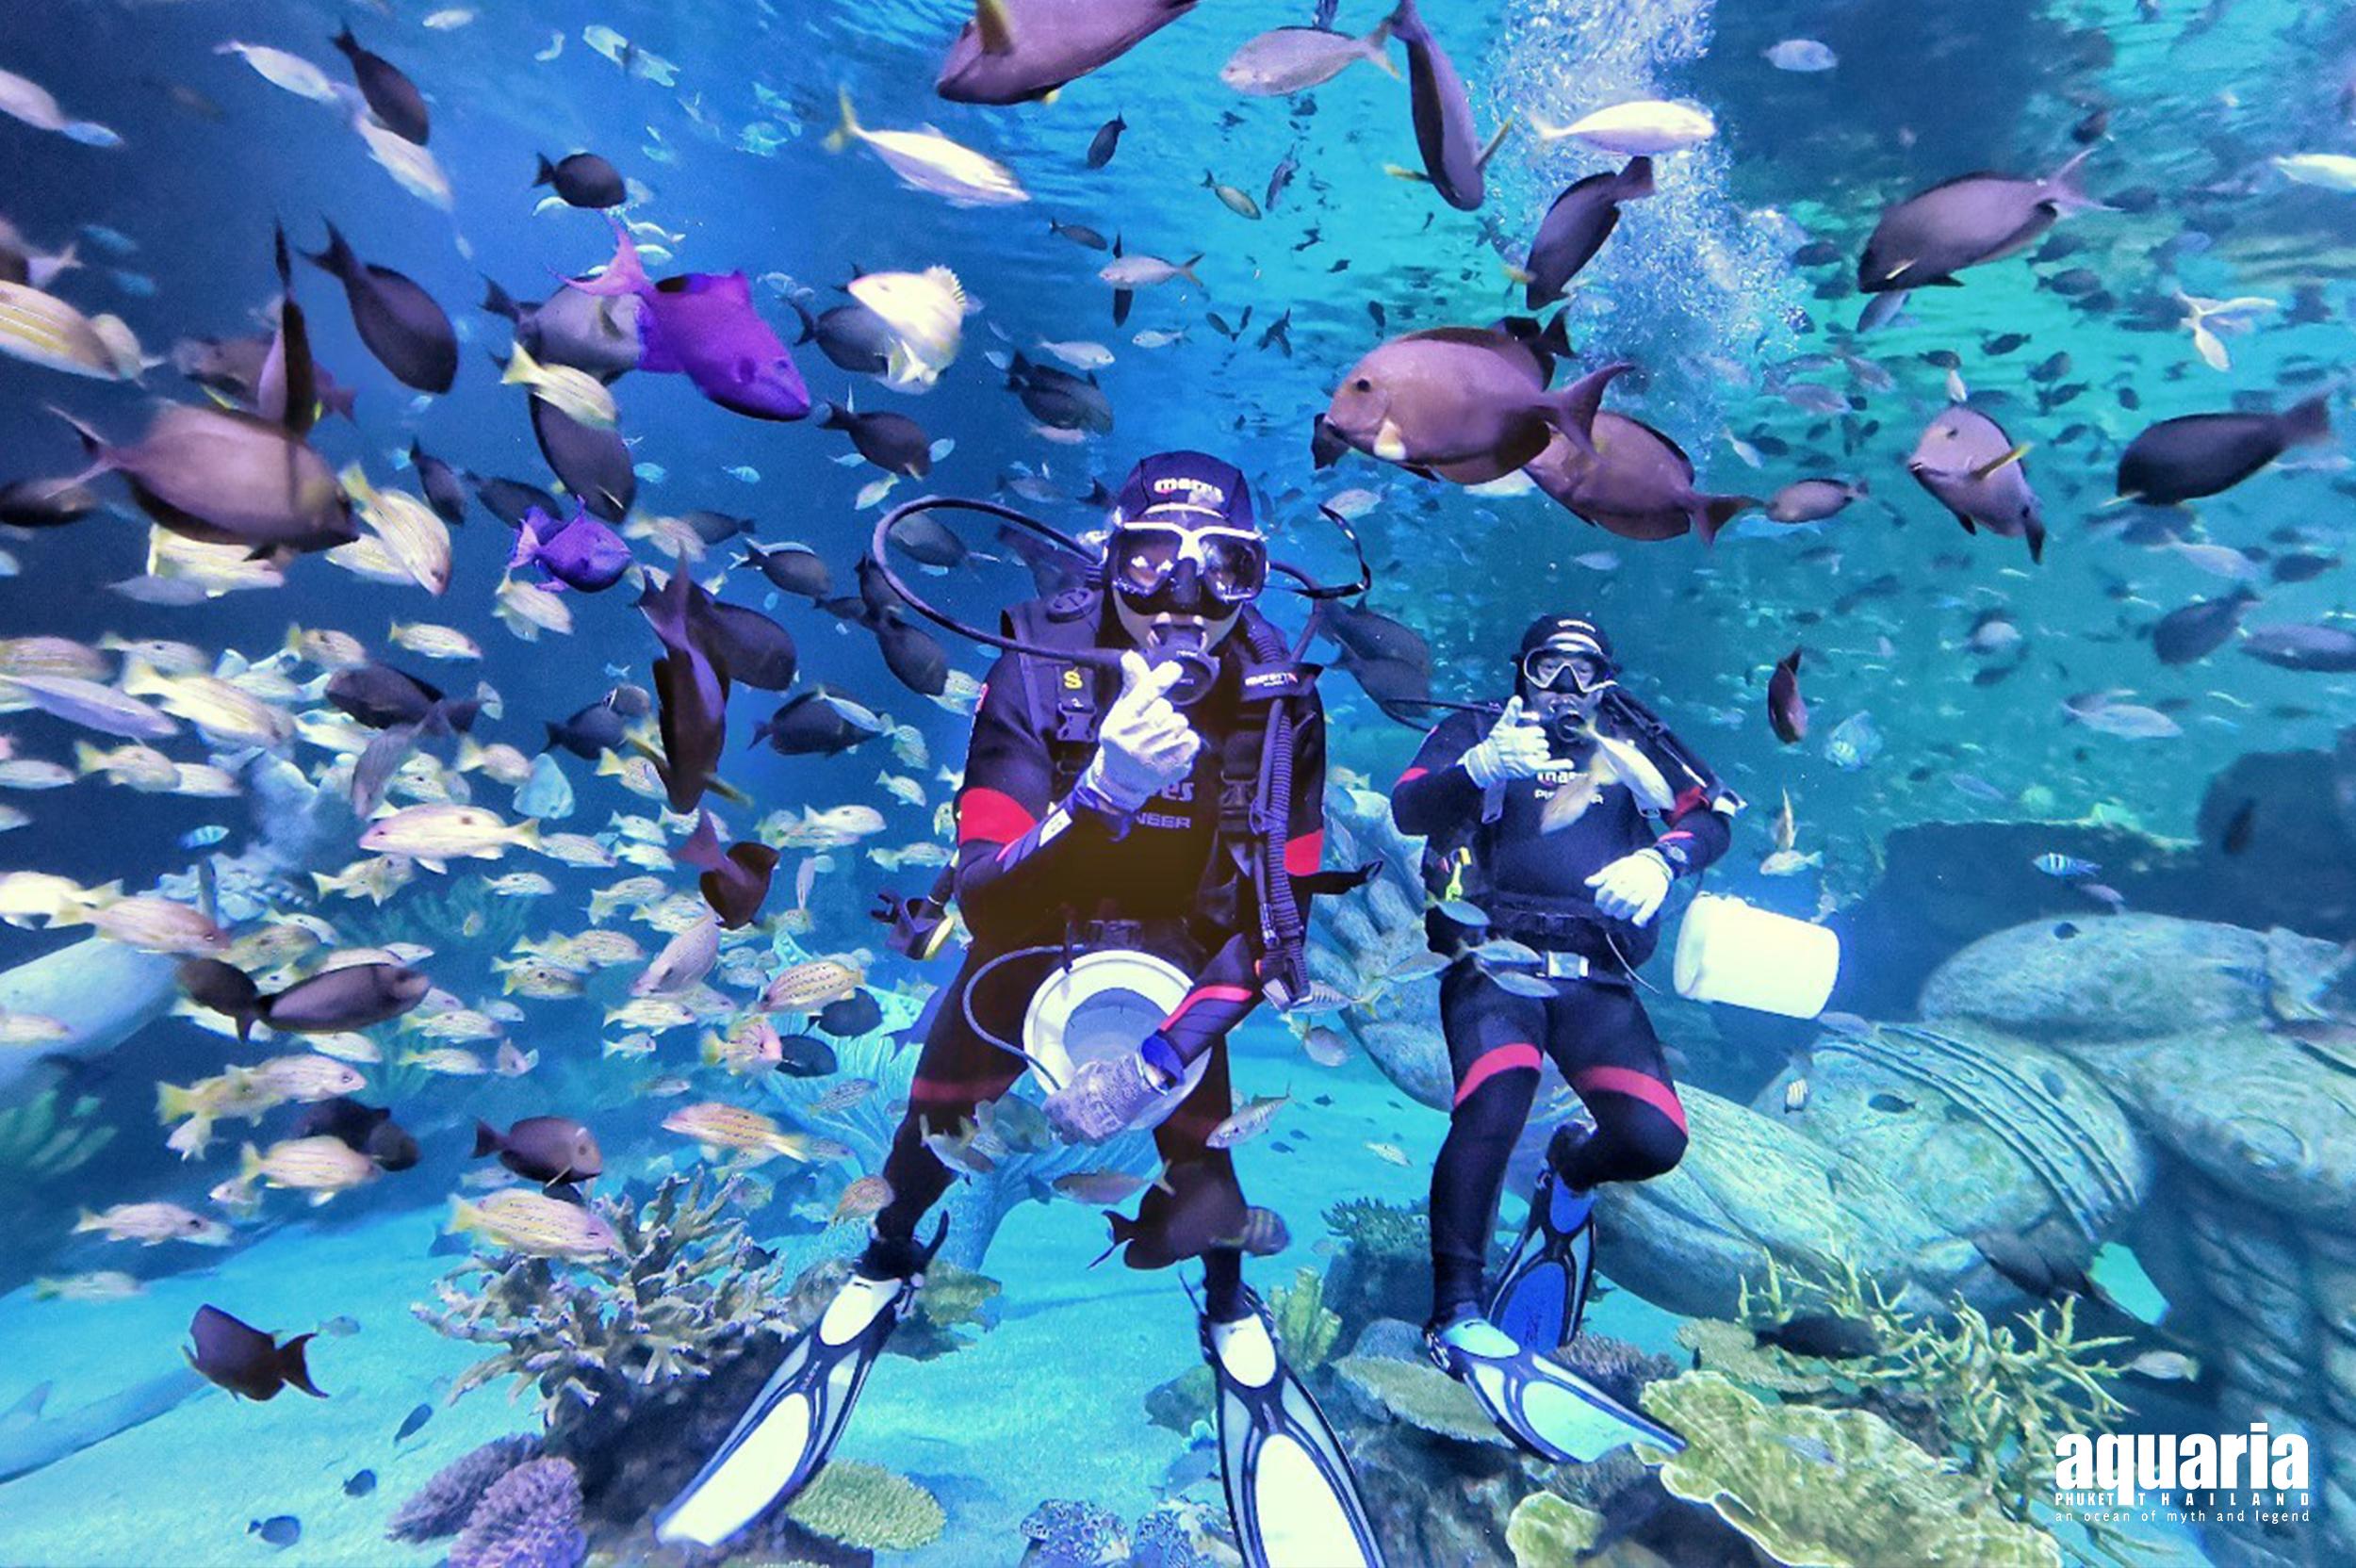 Aquaria Phuket Ticket